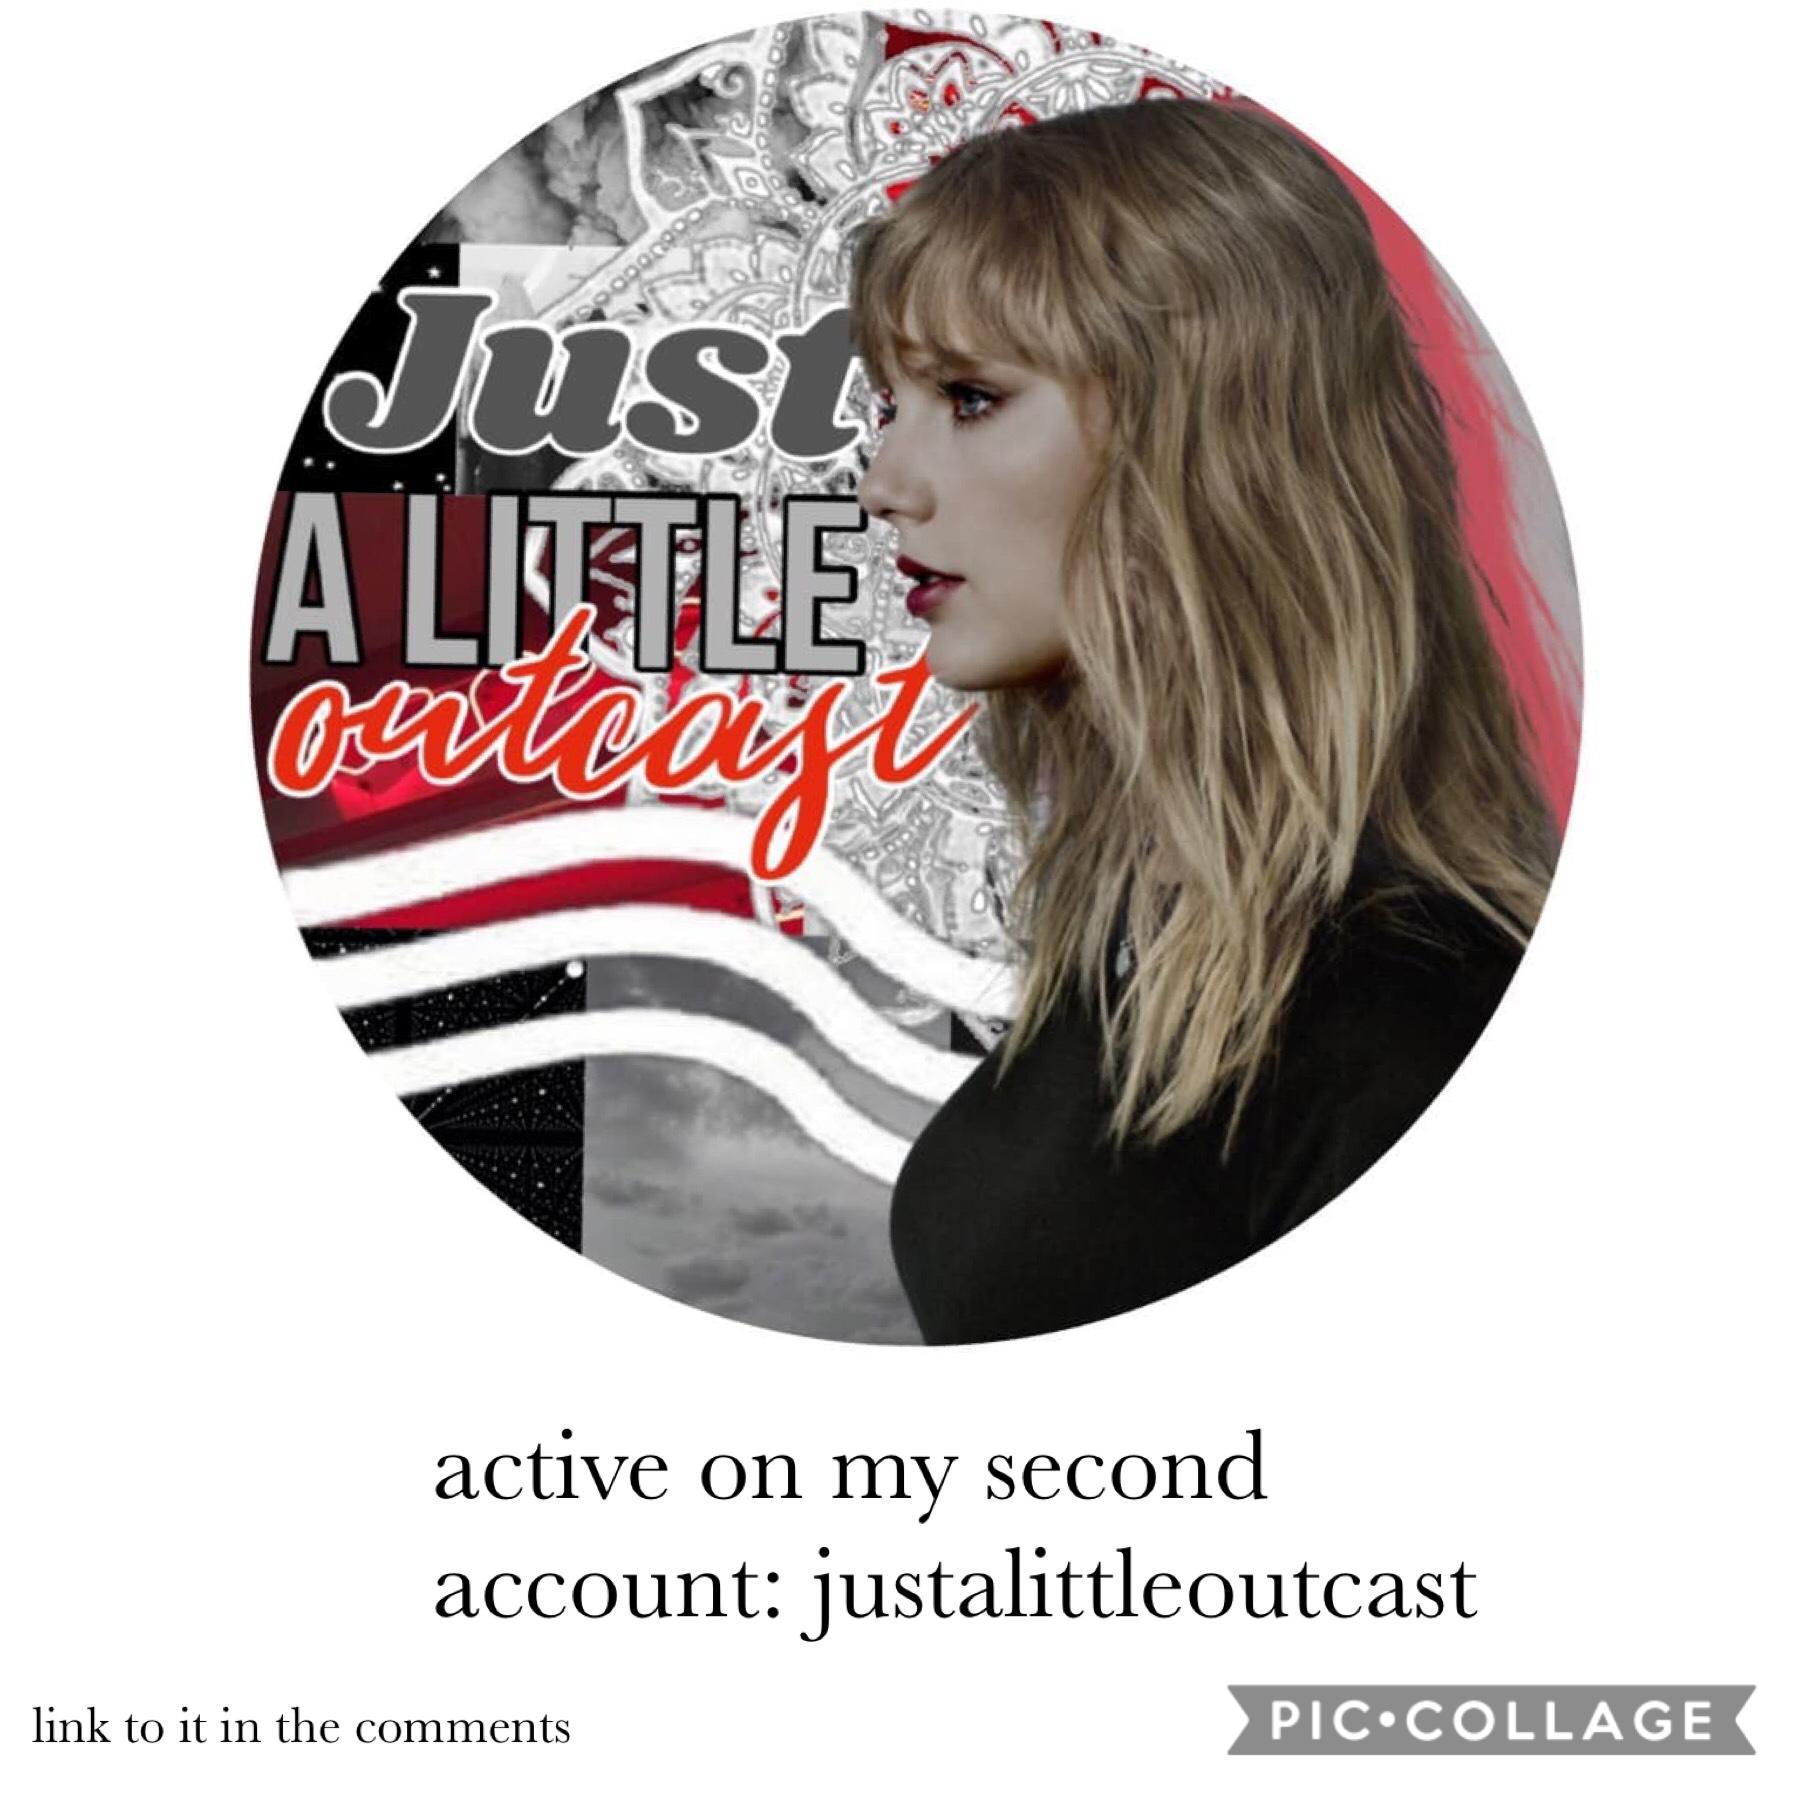 @justalittleoutcast